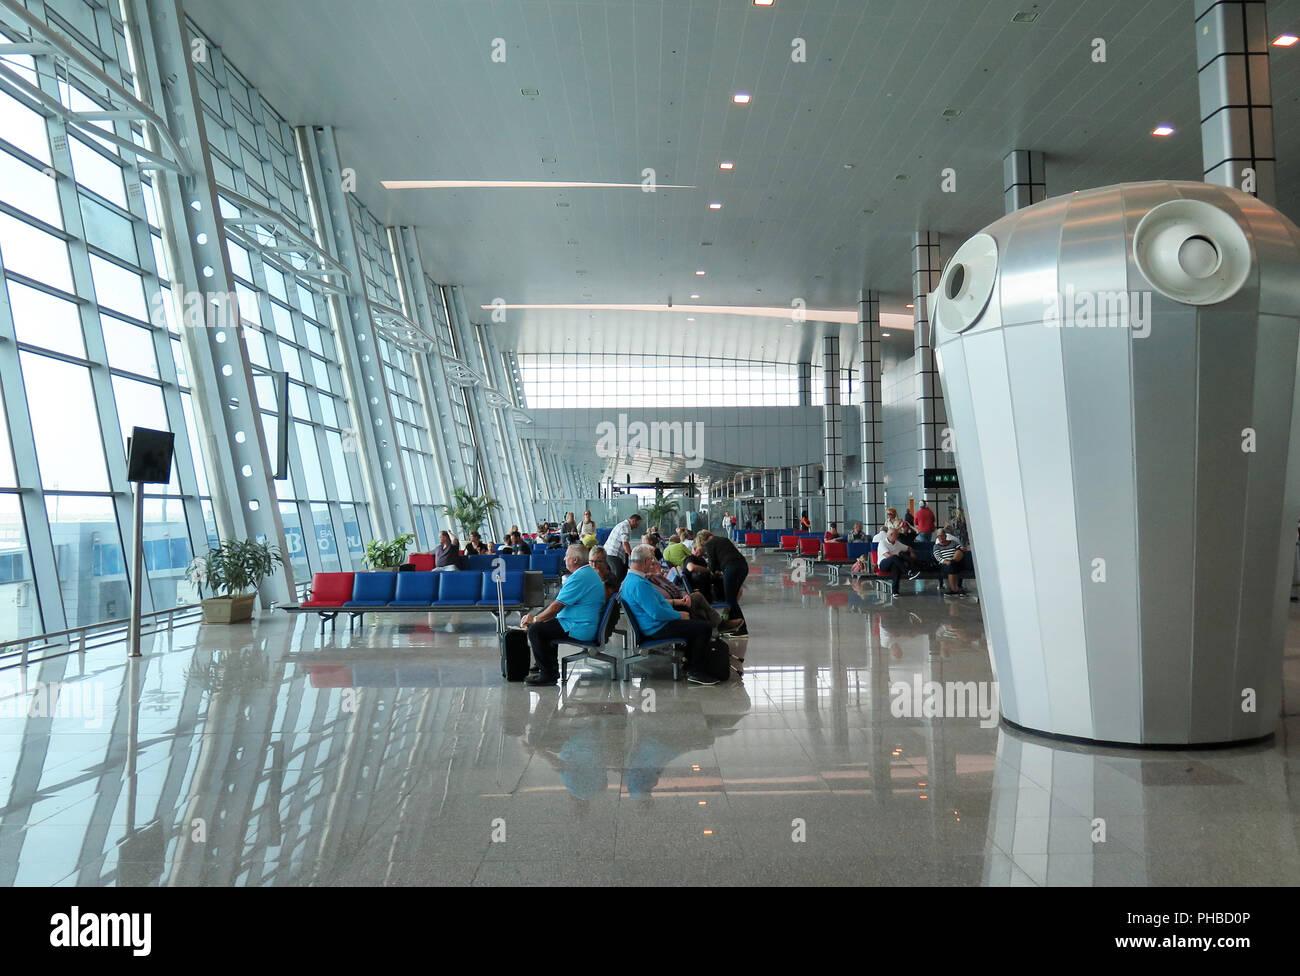 Flughafen Hurghada Ankunft Live